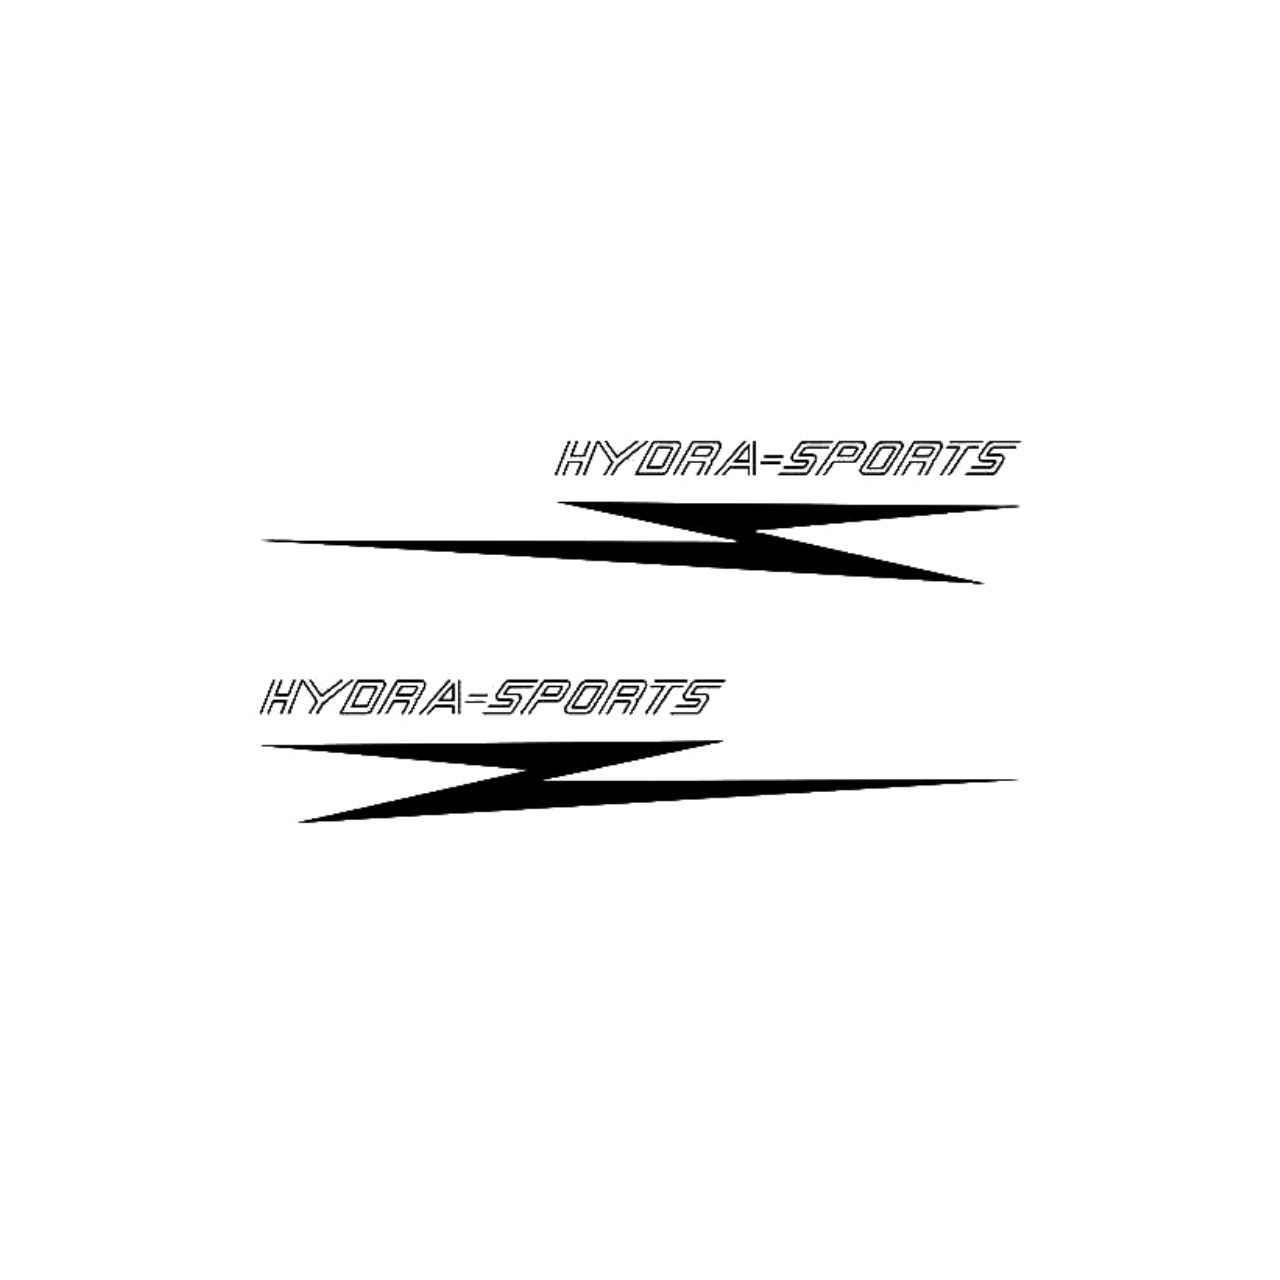 Hydra Sports Boat Kit Decal Sticker Ballzbeatz Com